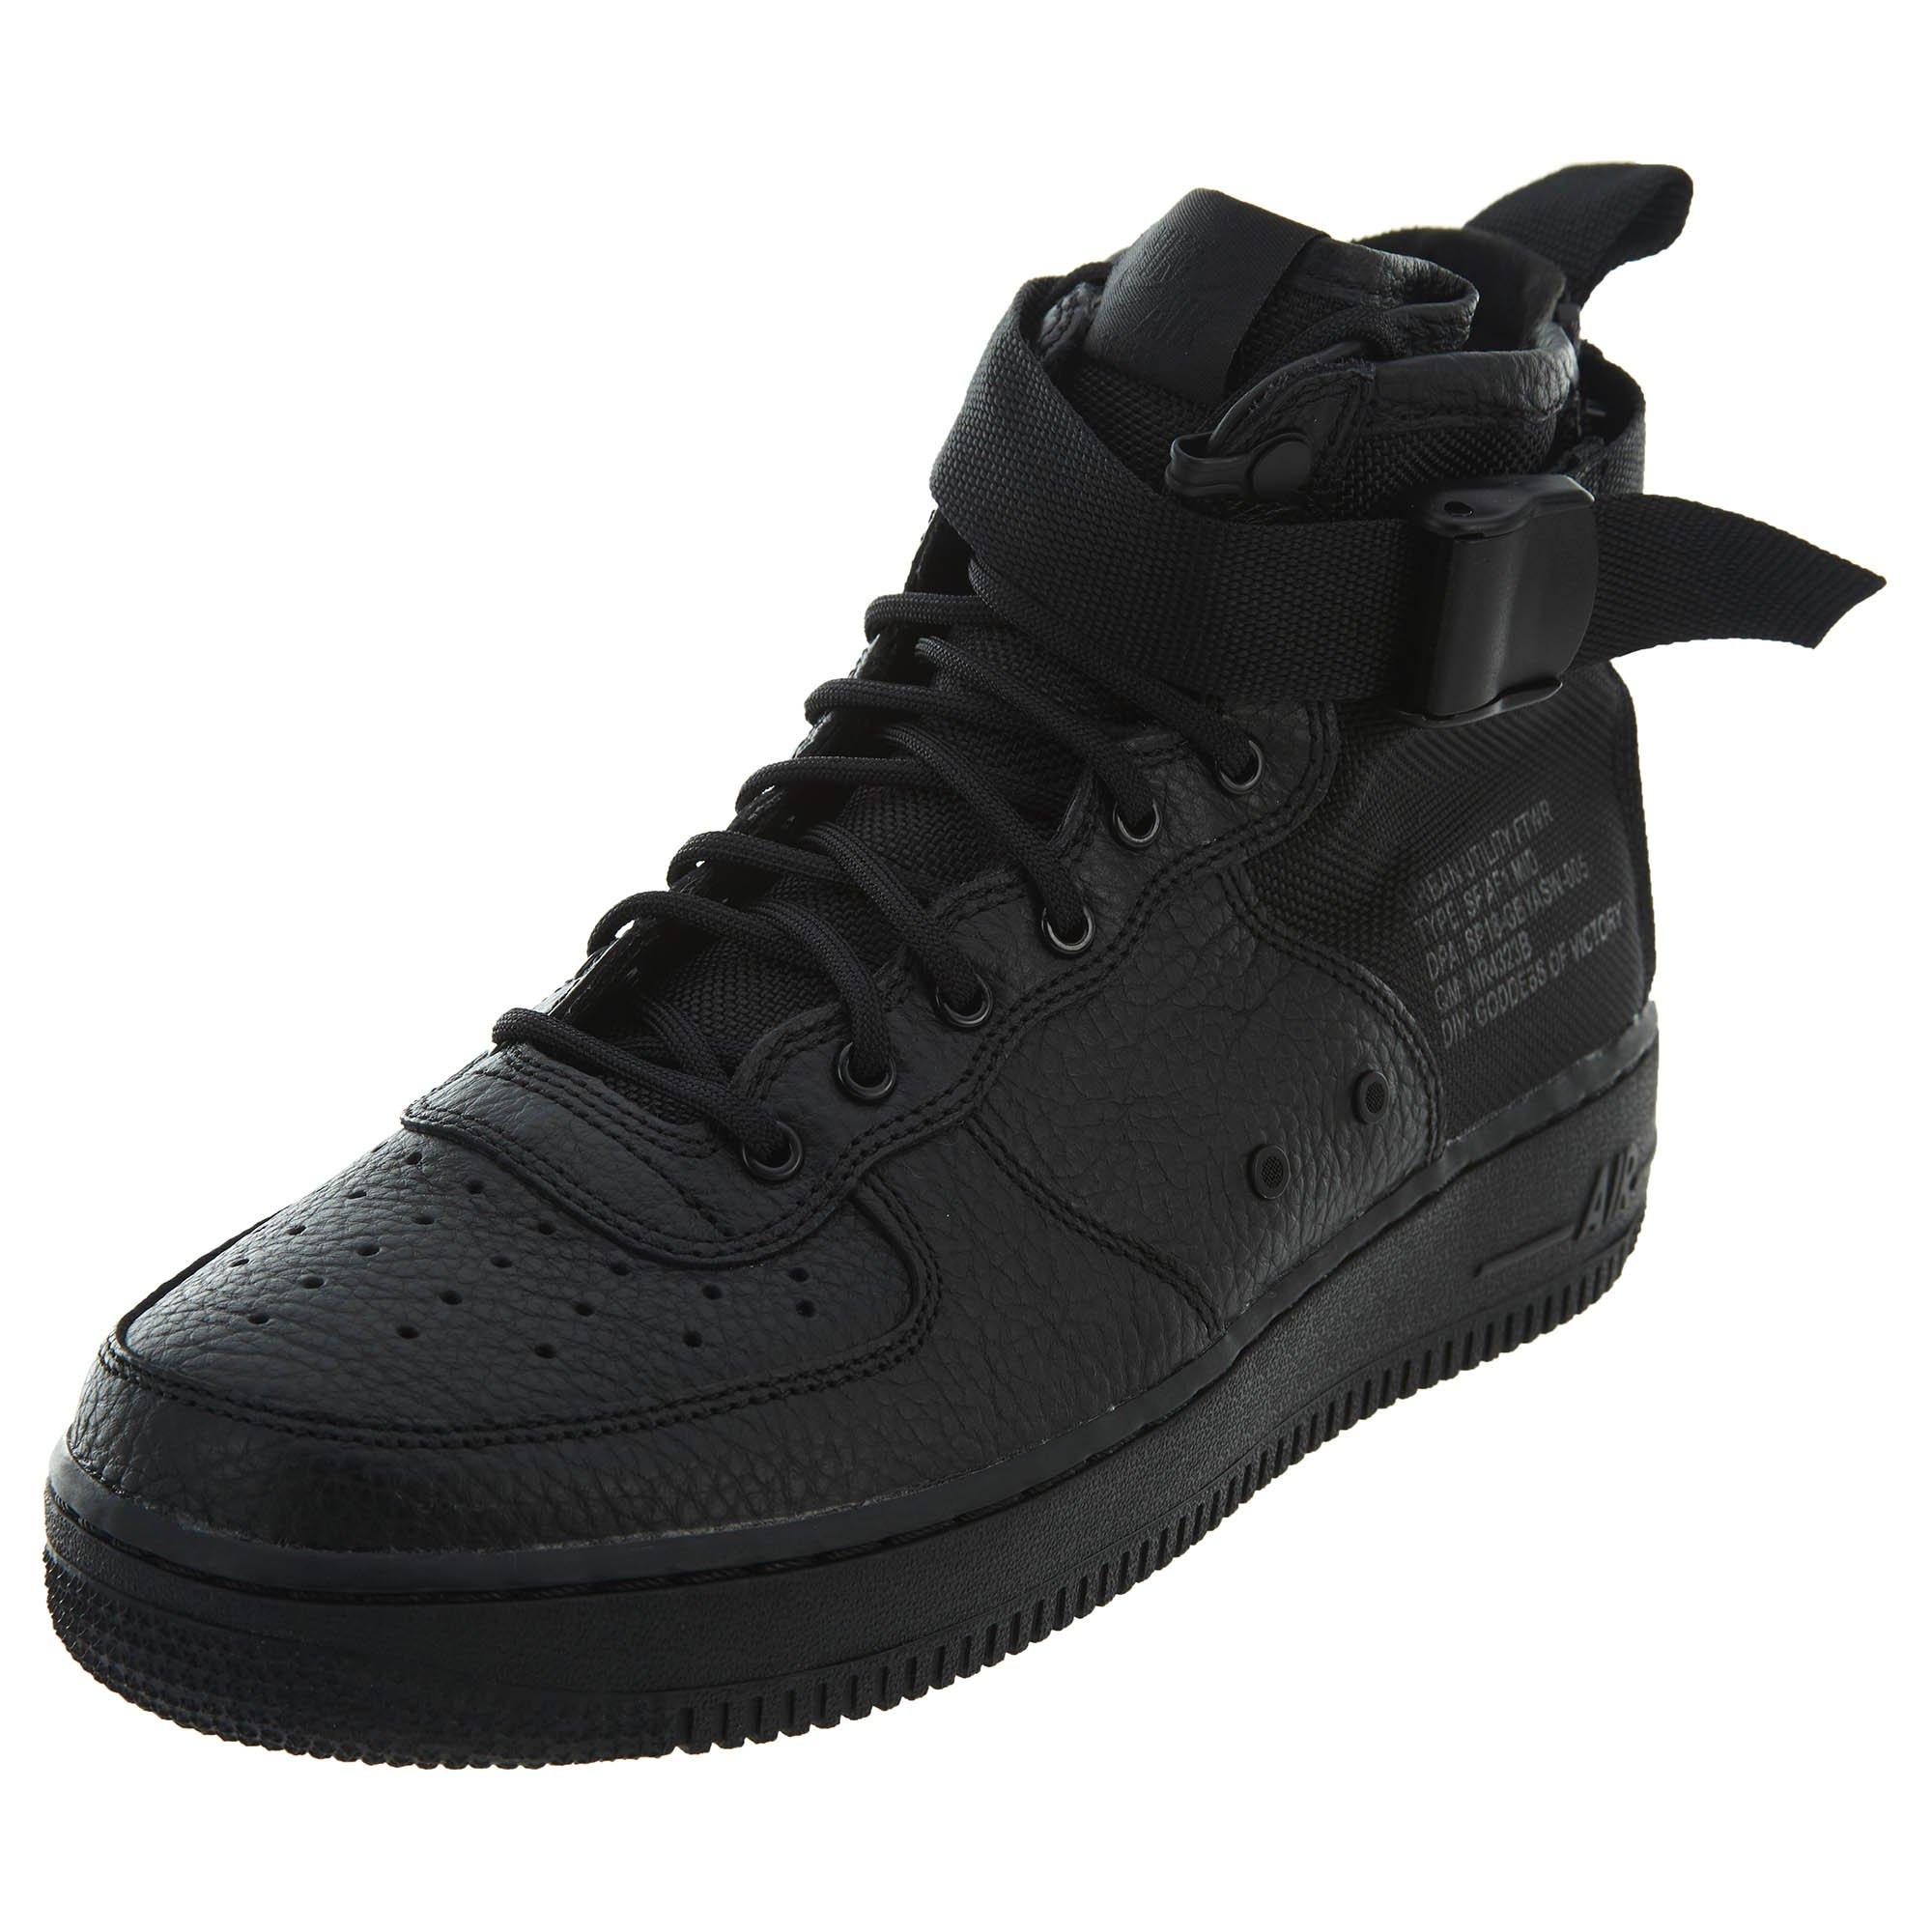 brand new a71ce 50ed3 Galleon - Nike SF AF1 Air Force MID Big Kids Shoes Black Aj0424-003 (7 M US)